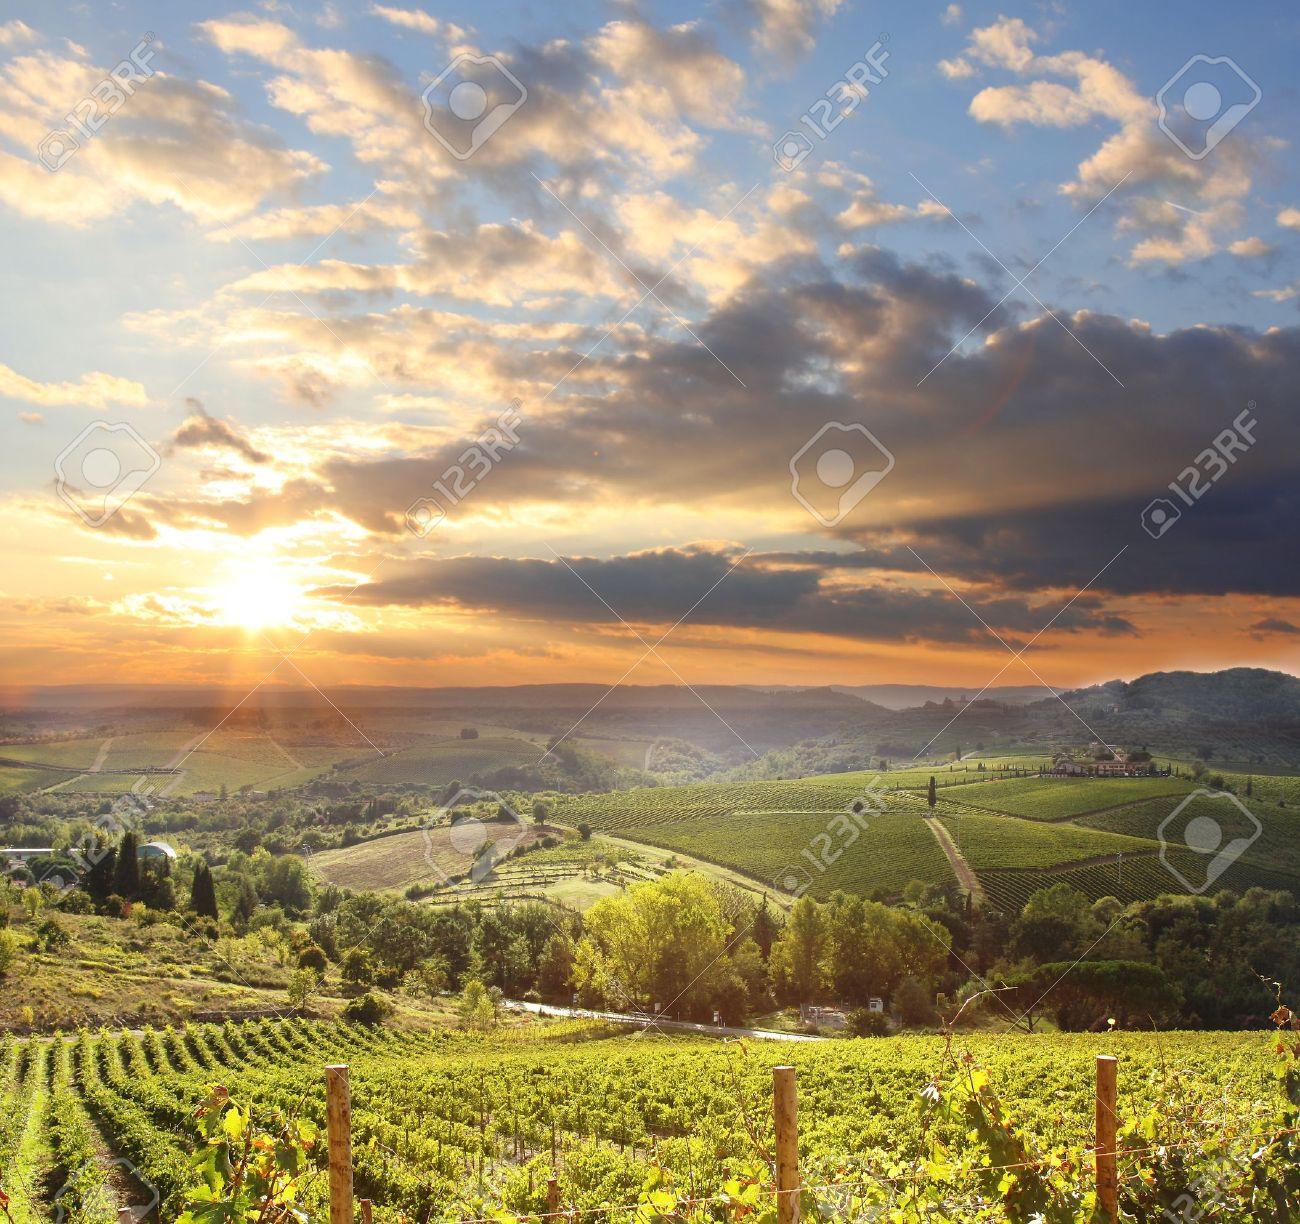 Chianti vineyard landscape in Tuscany, Italy - 15541207